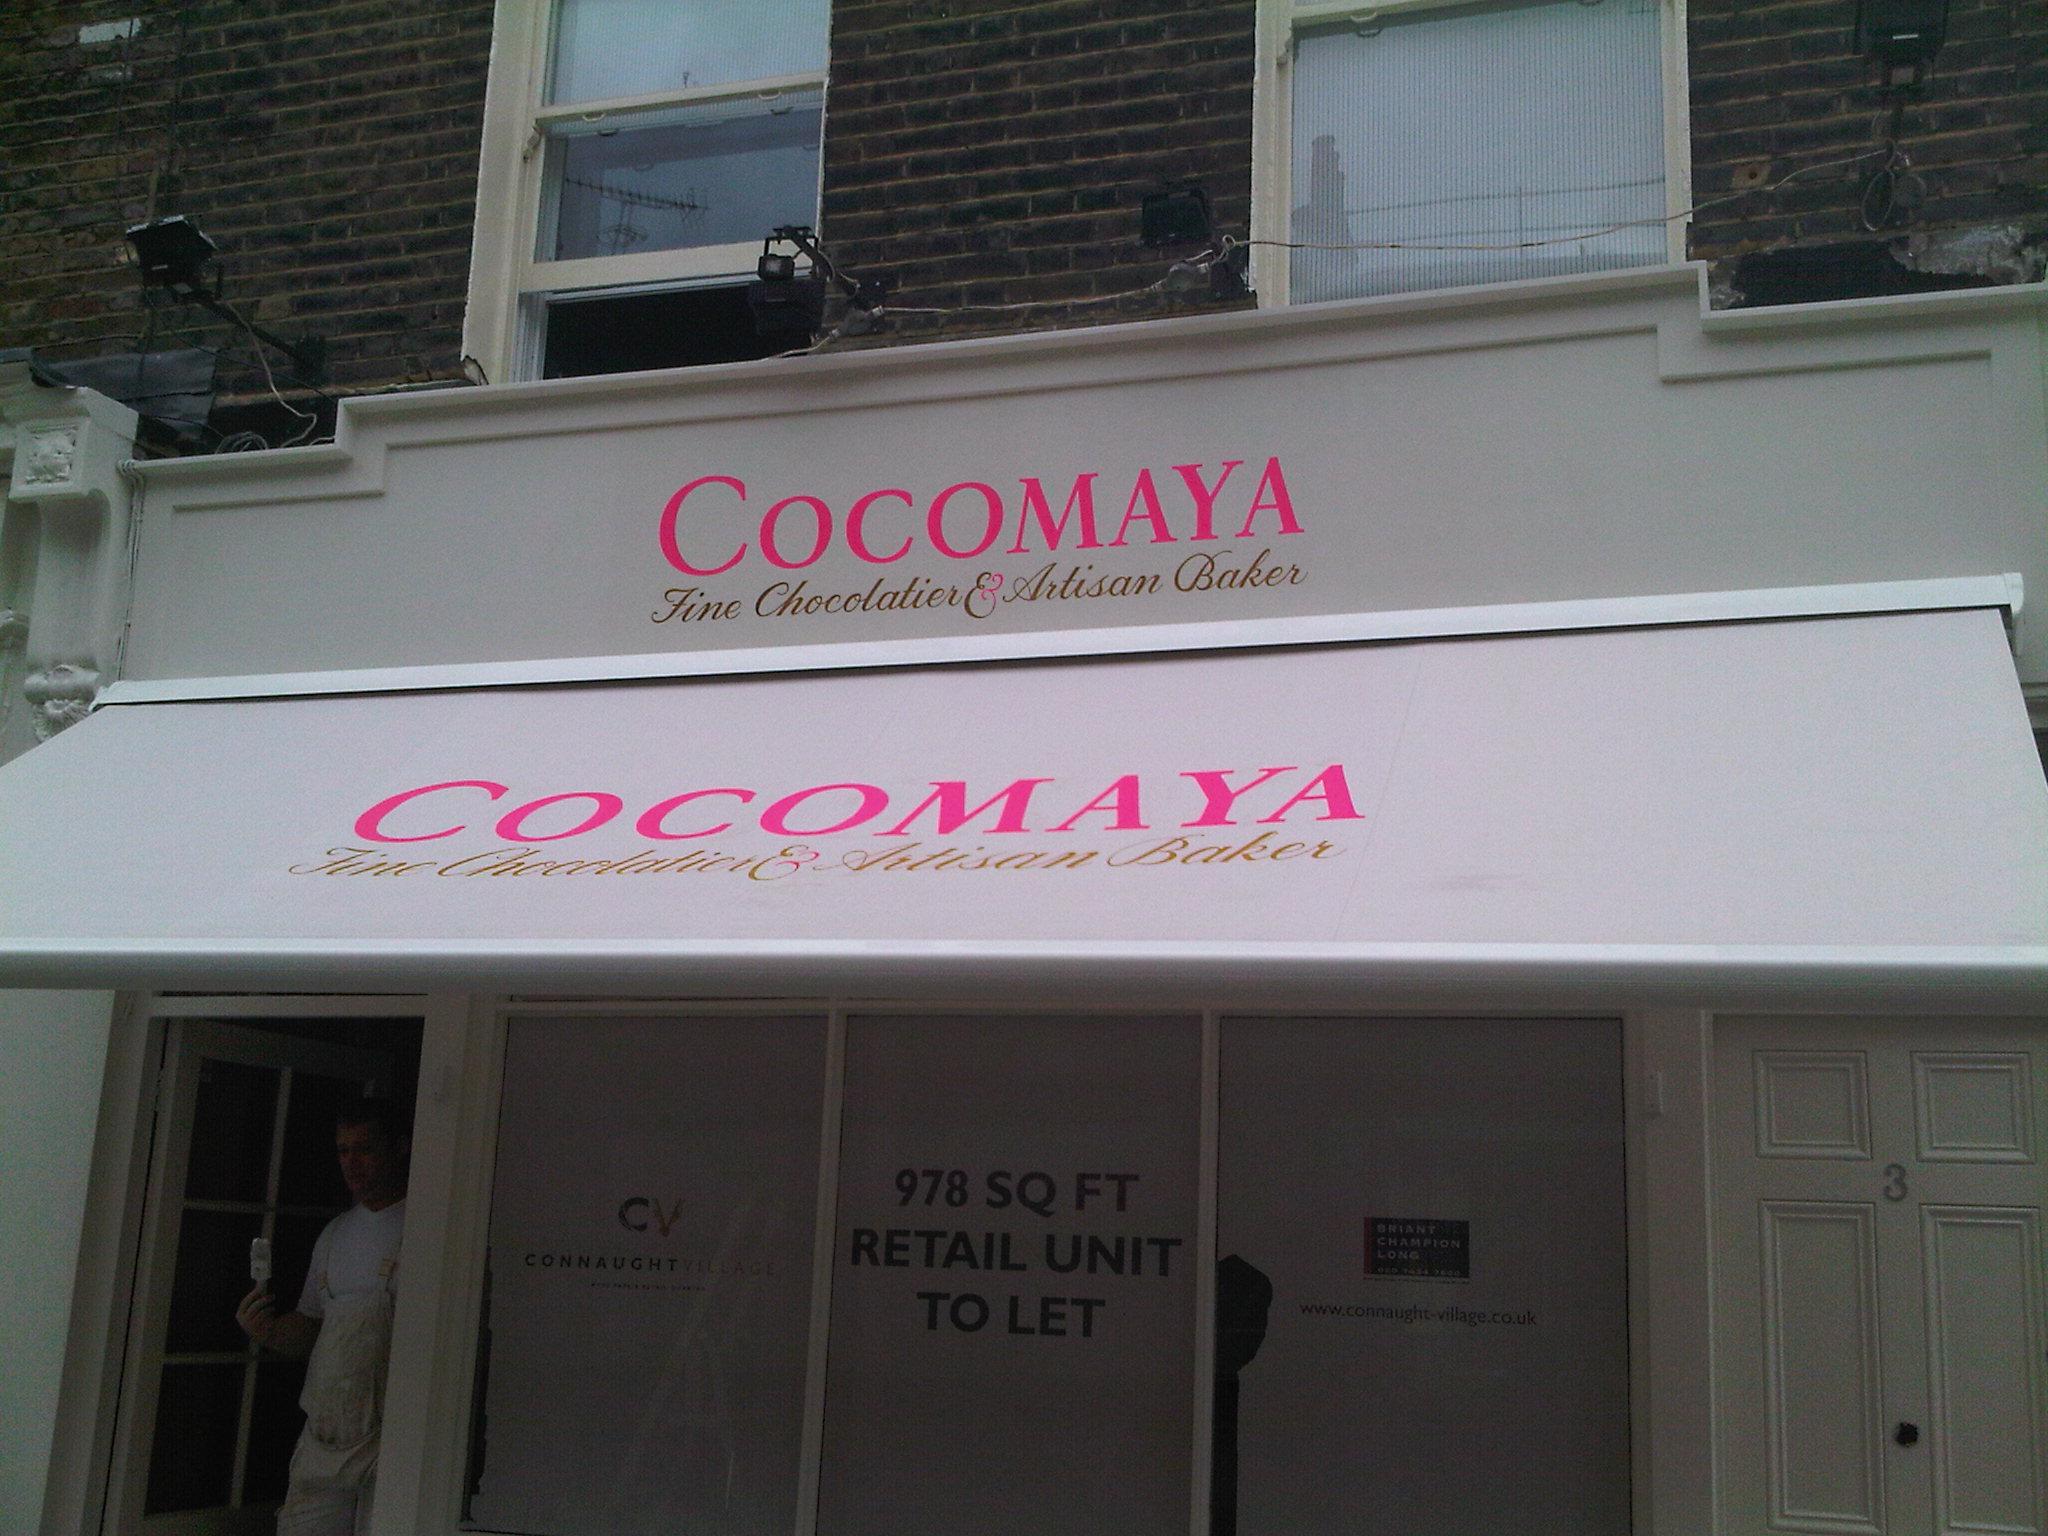 Cocomaya